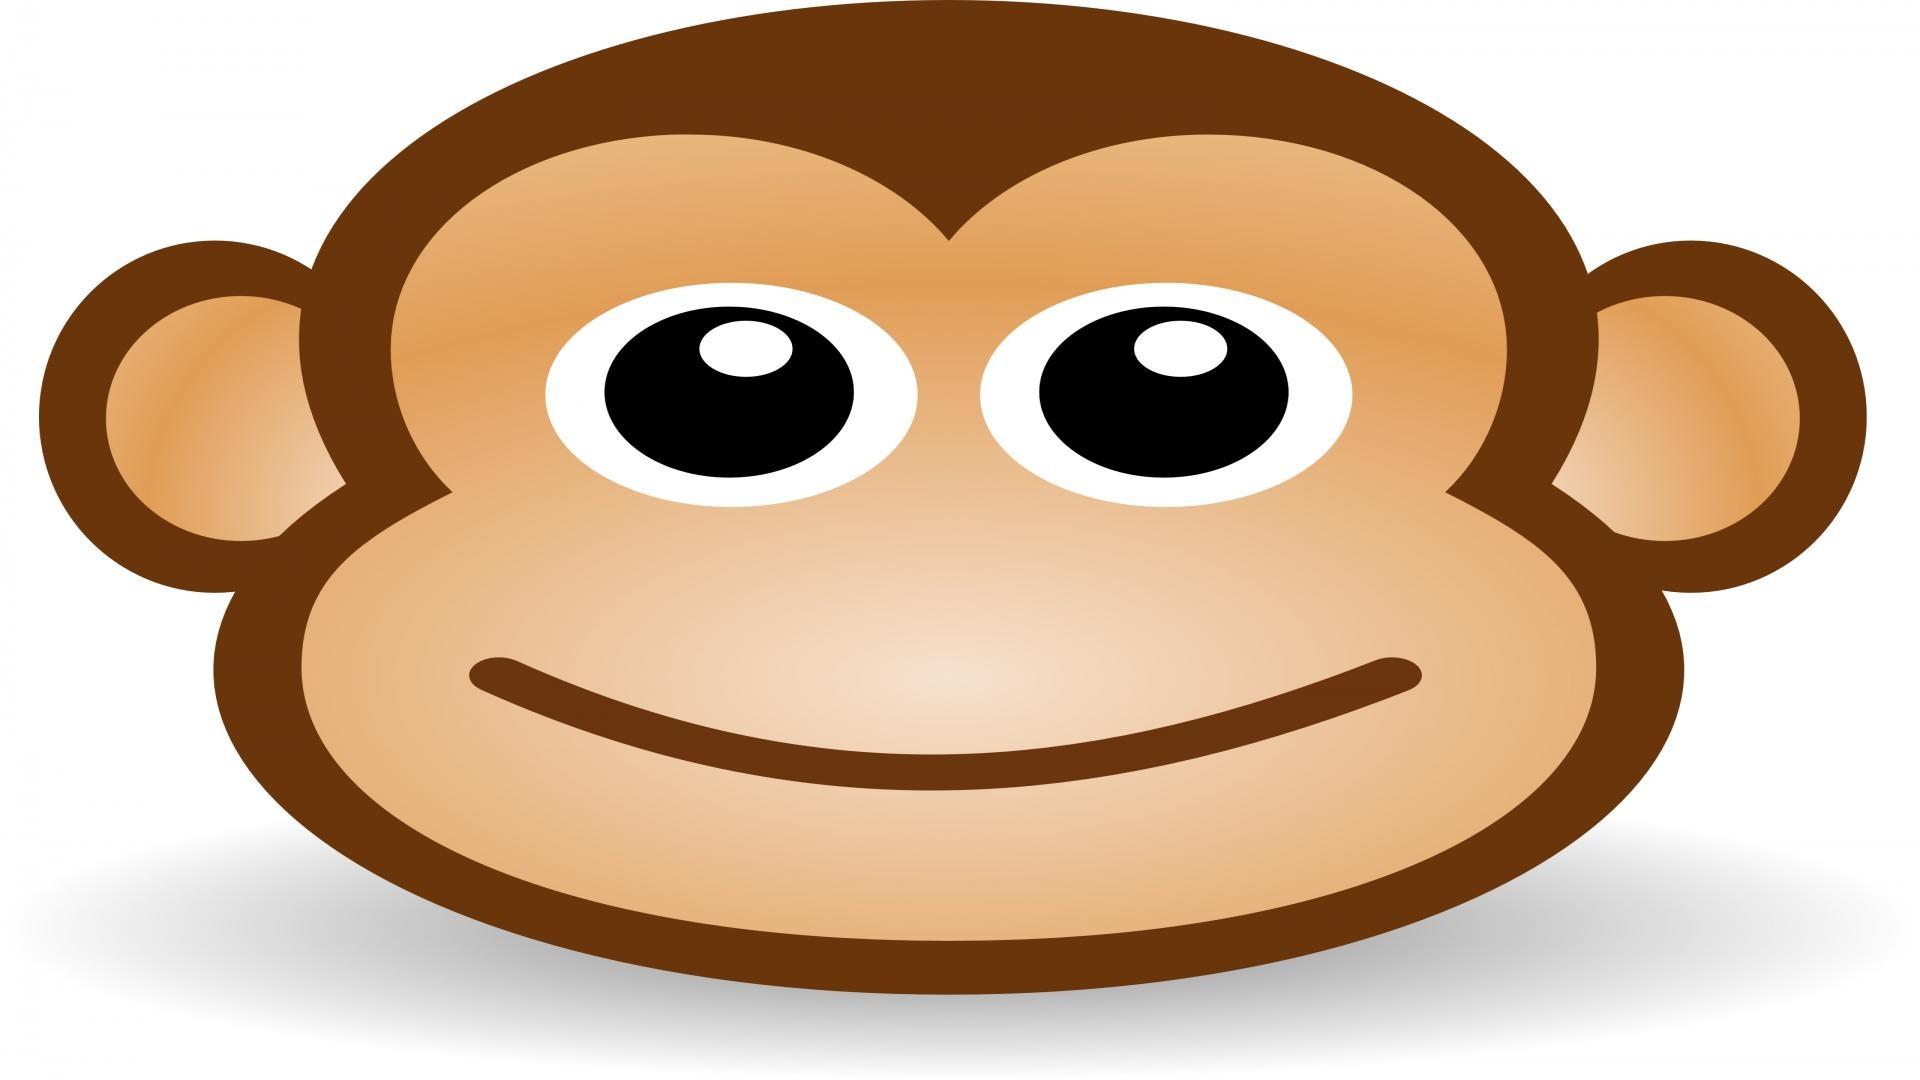 Cartoon Monkey Wallpapers ·① WallpaperTag